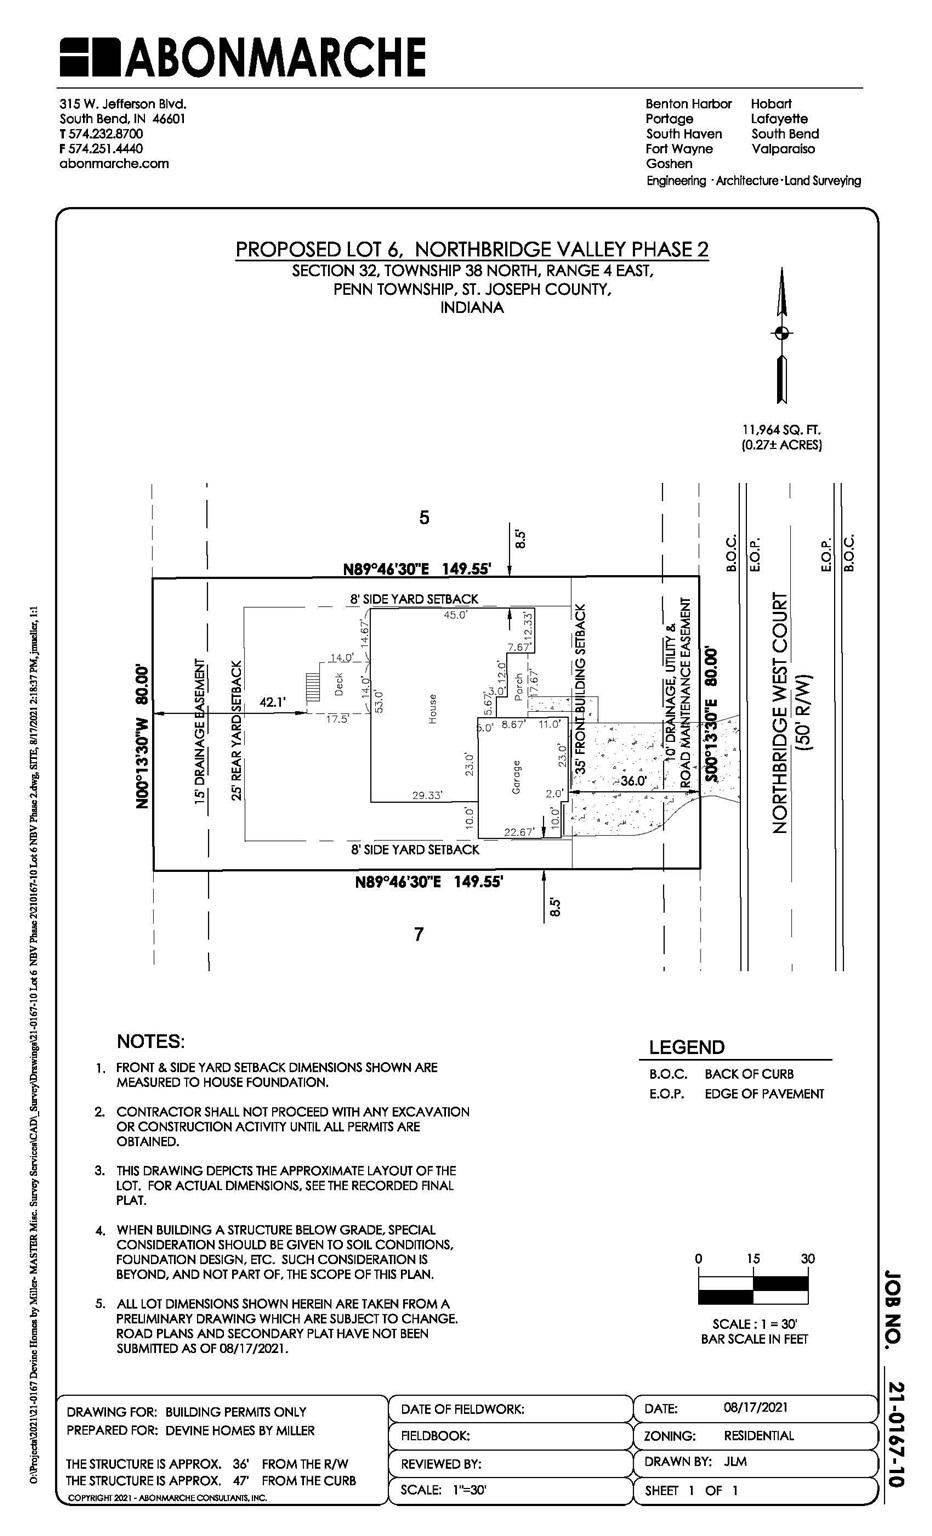 54811 Northbridge West Osceola, IN 46561